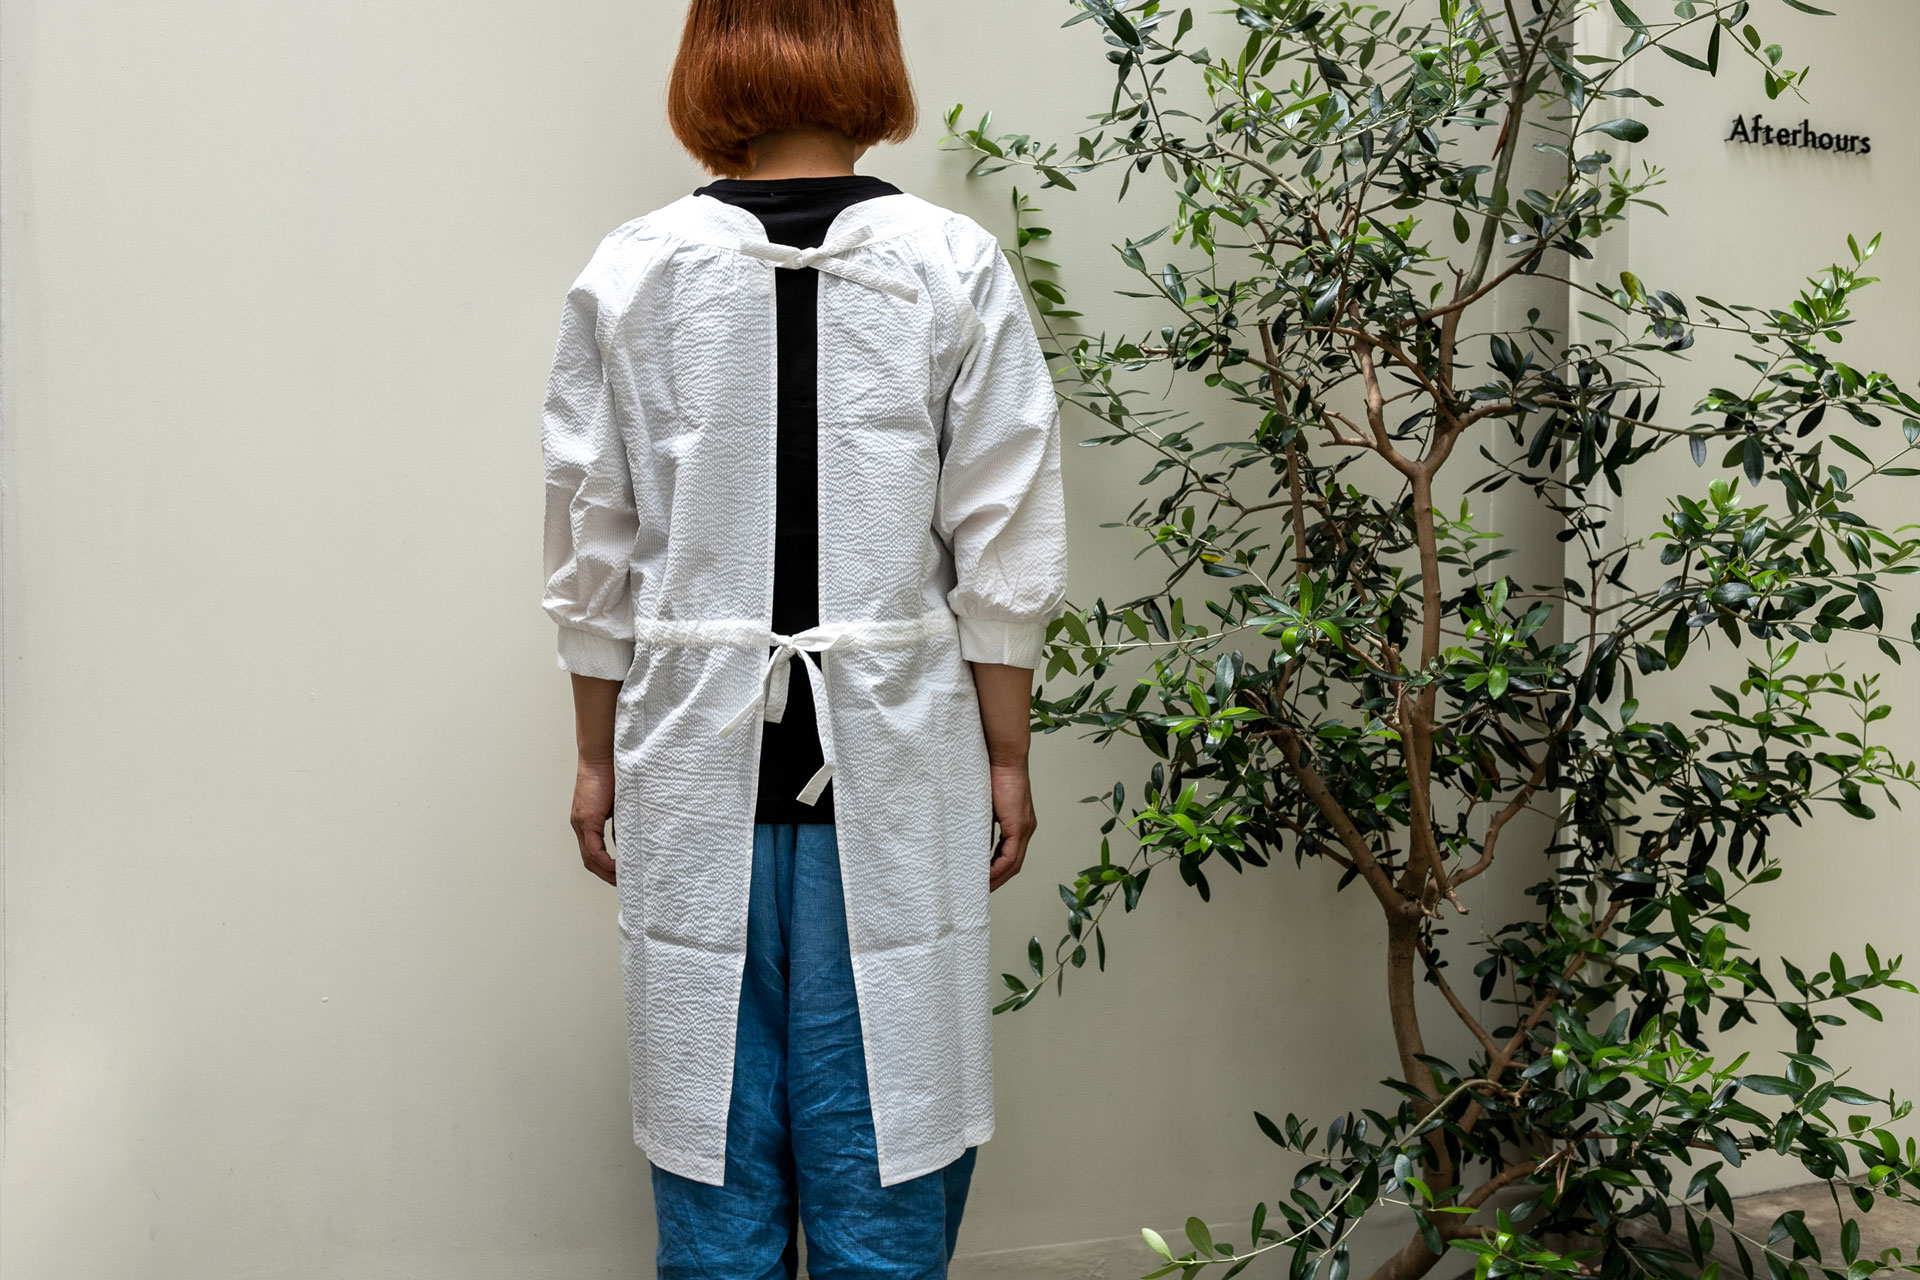 Afterhoursの製菓服